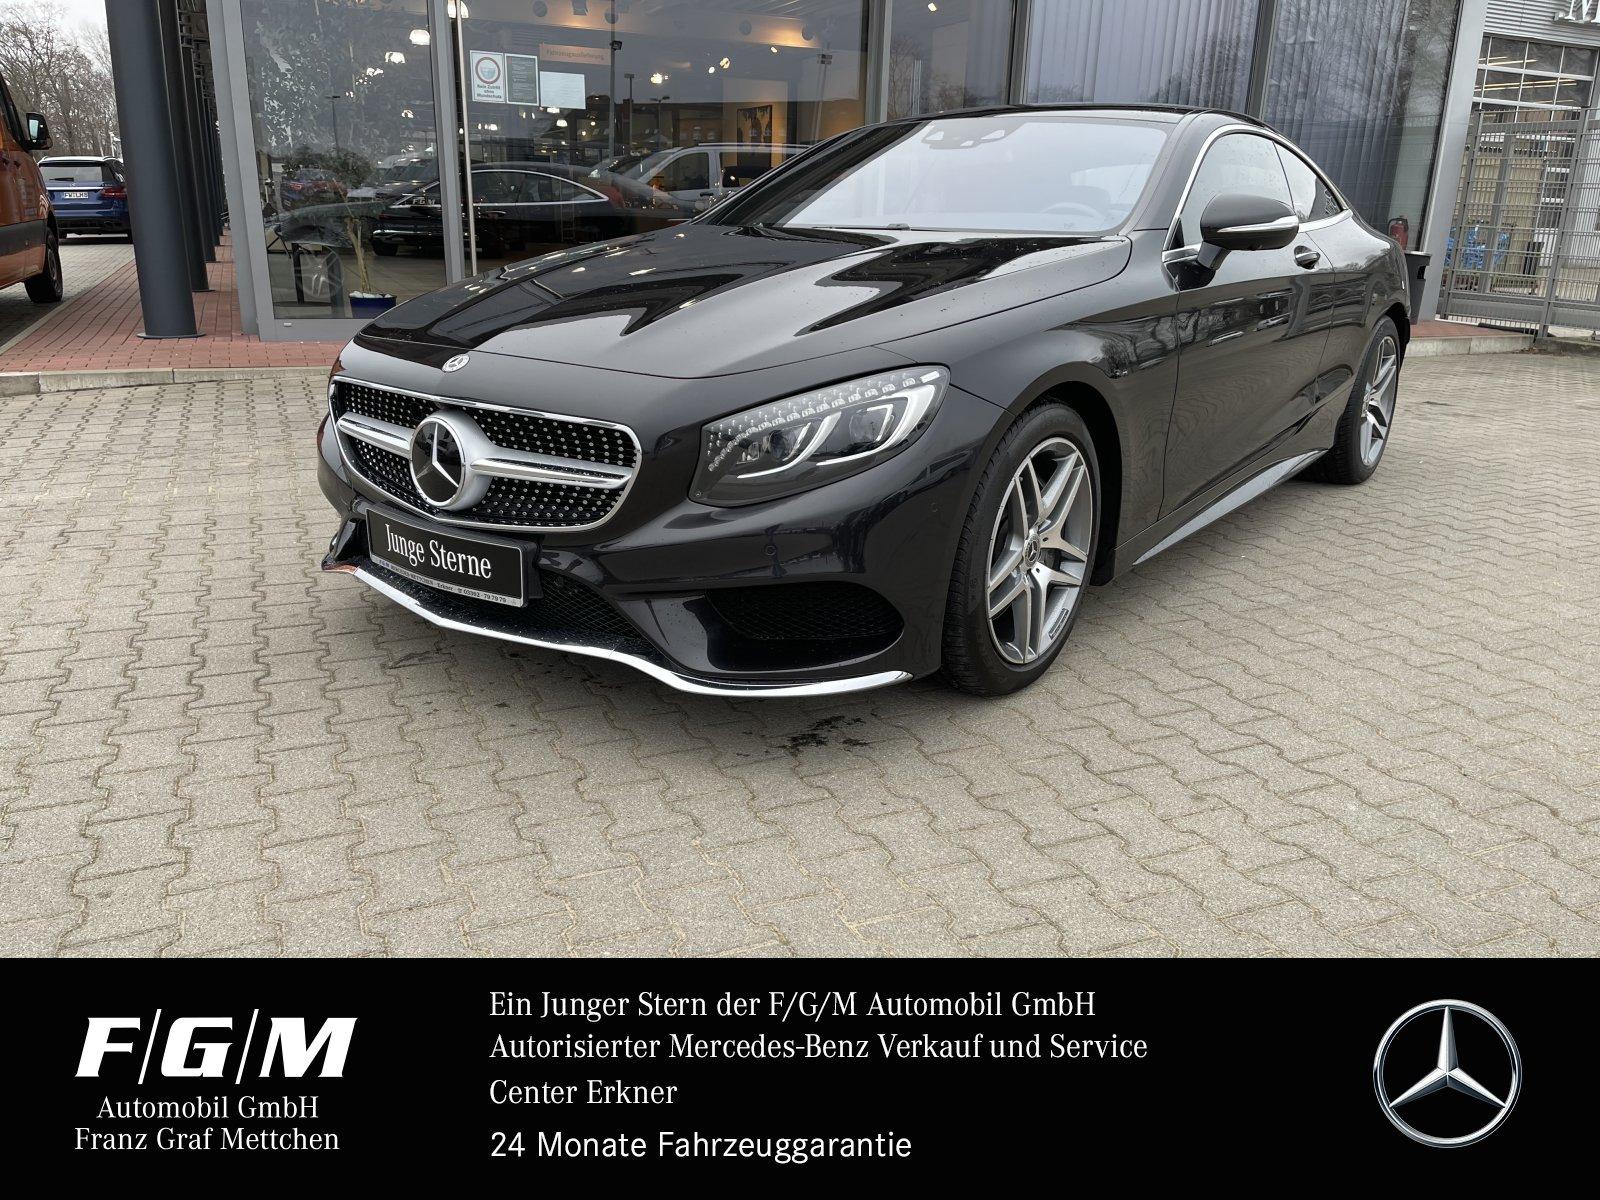 Mercedes-Benz S 400 4M AMG/PanoD/KeyG/360°/Mem/Burm/Sitzklima, Jahr 2017, Benzin